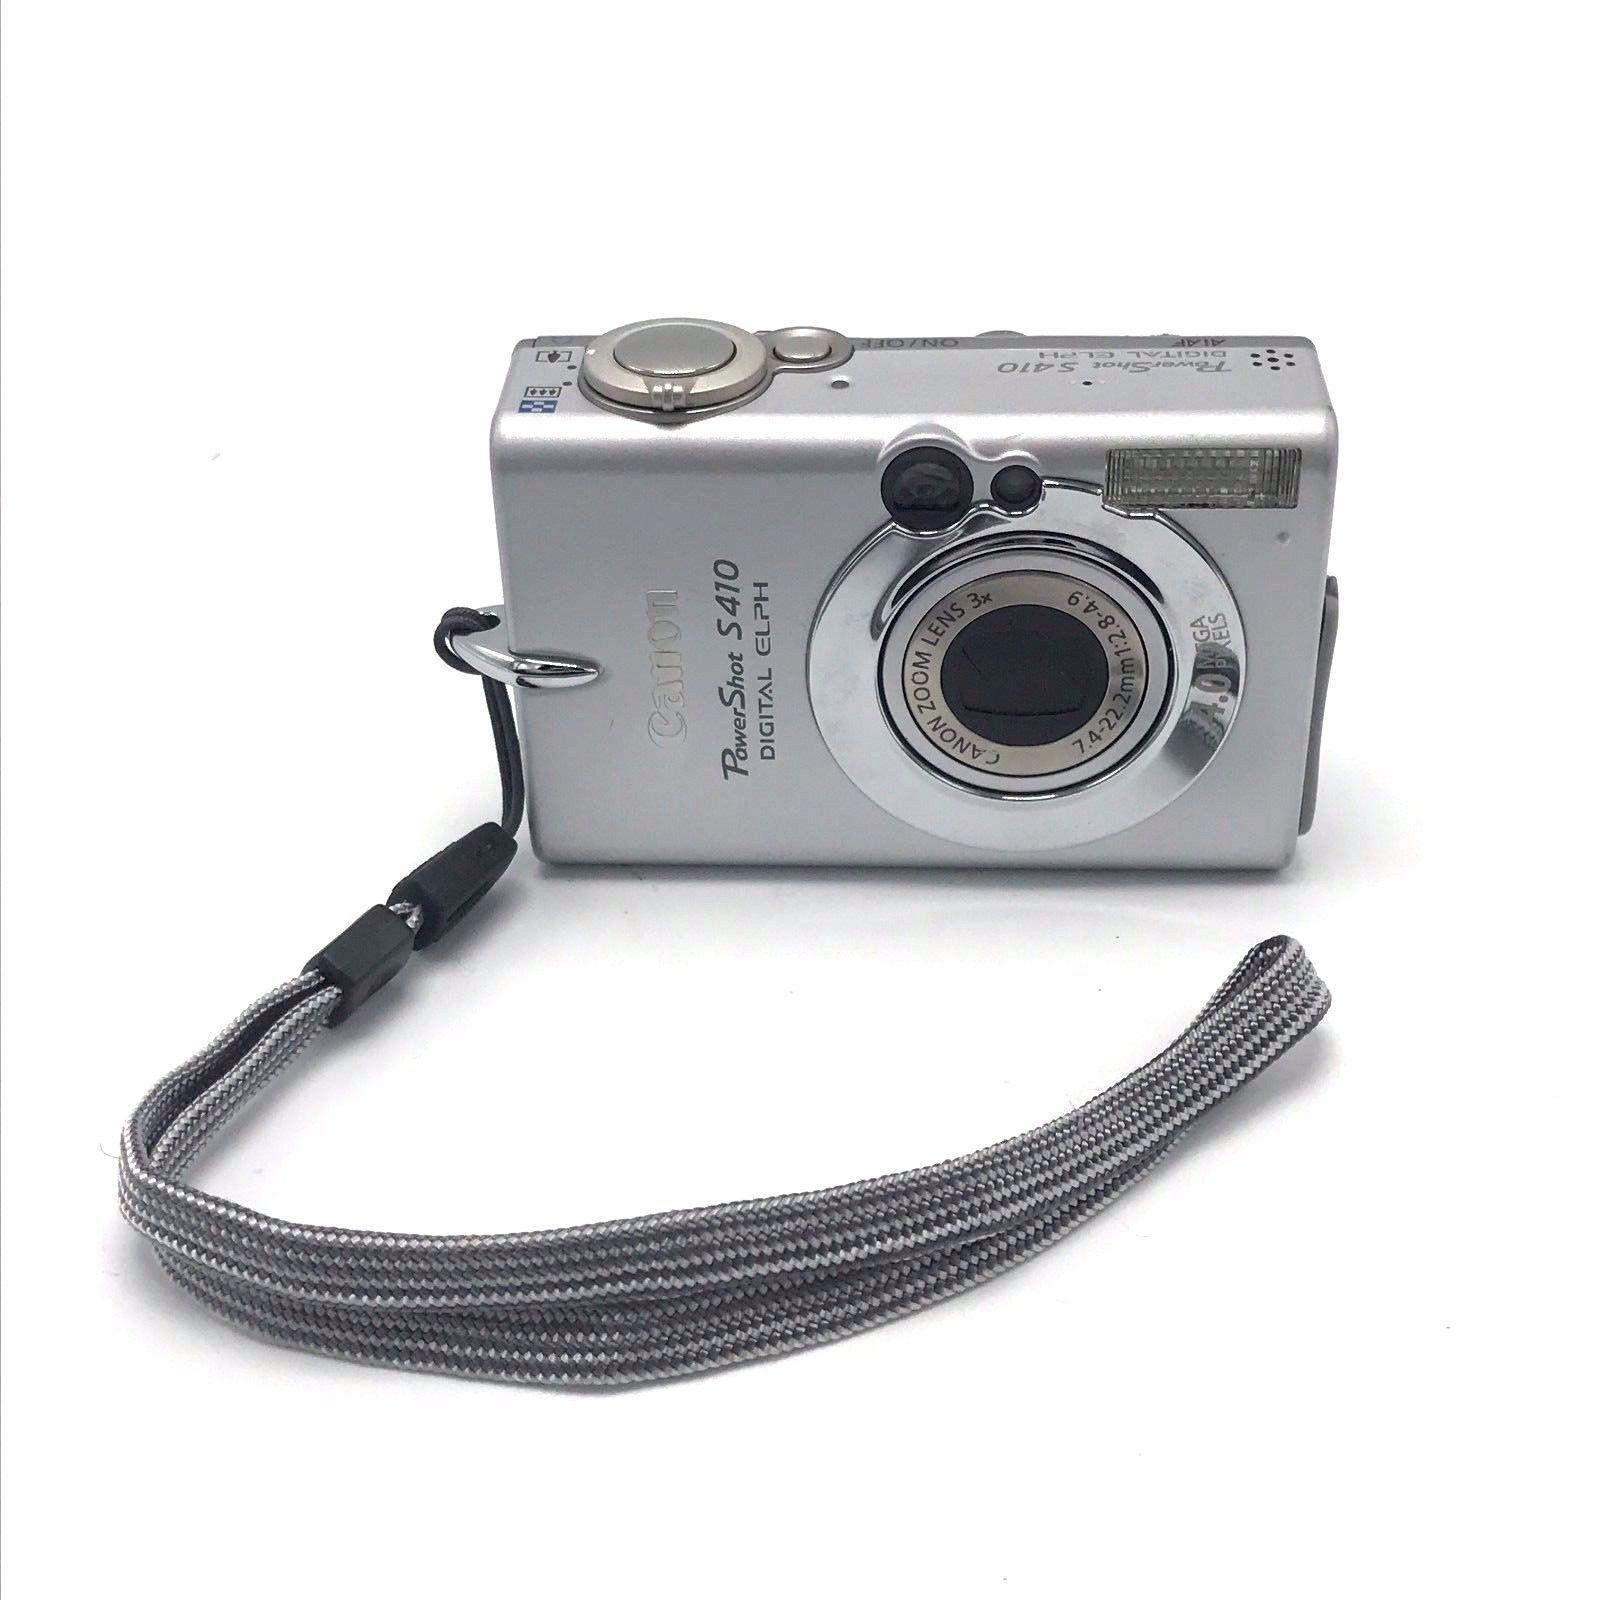 canon powershot s410 bundle user manual and 50 similar items rh bonanza com